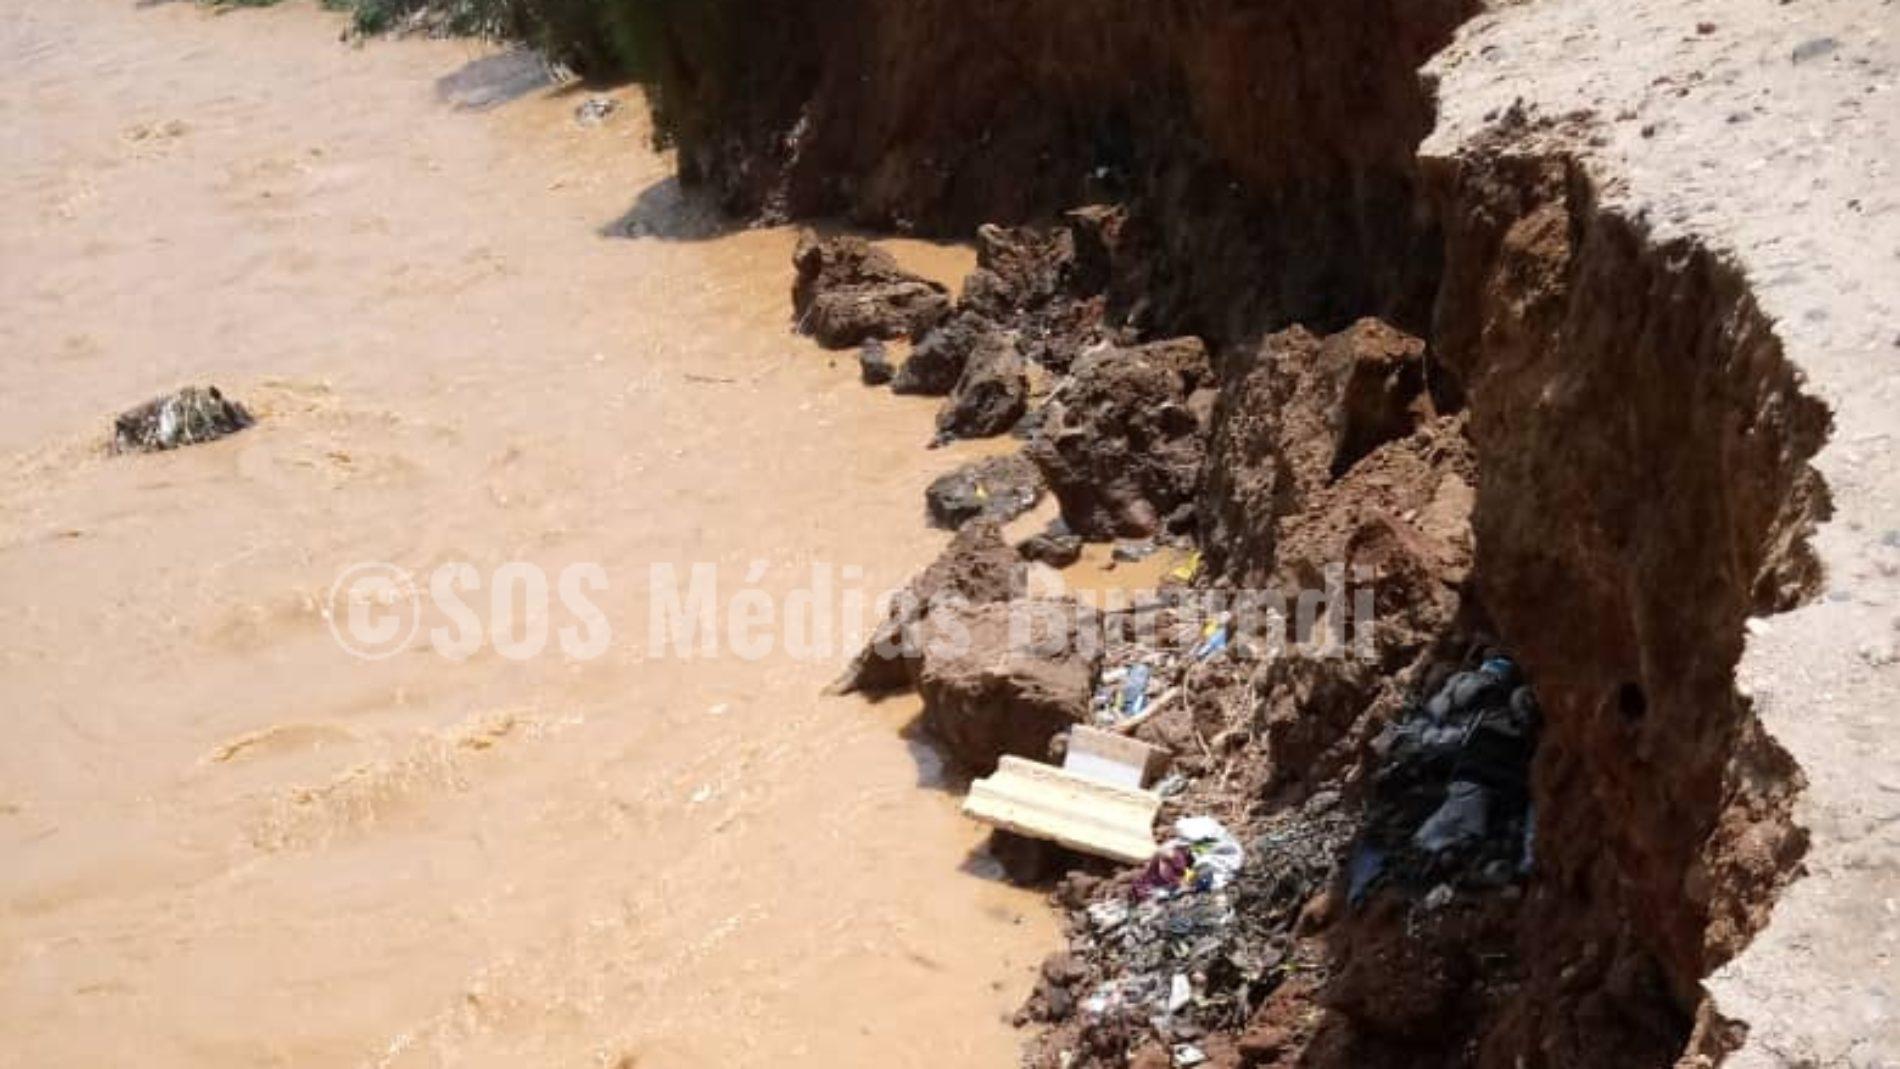 La rivière Ntahangwa menace un pont  à Buyenzi (Bujumbura)